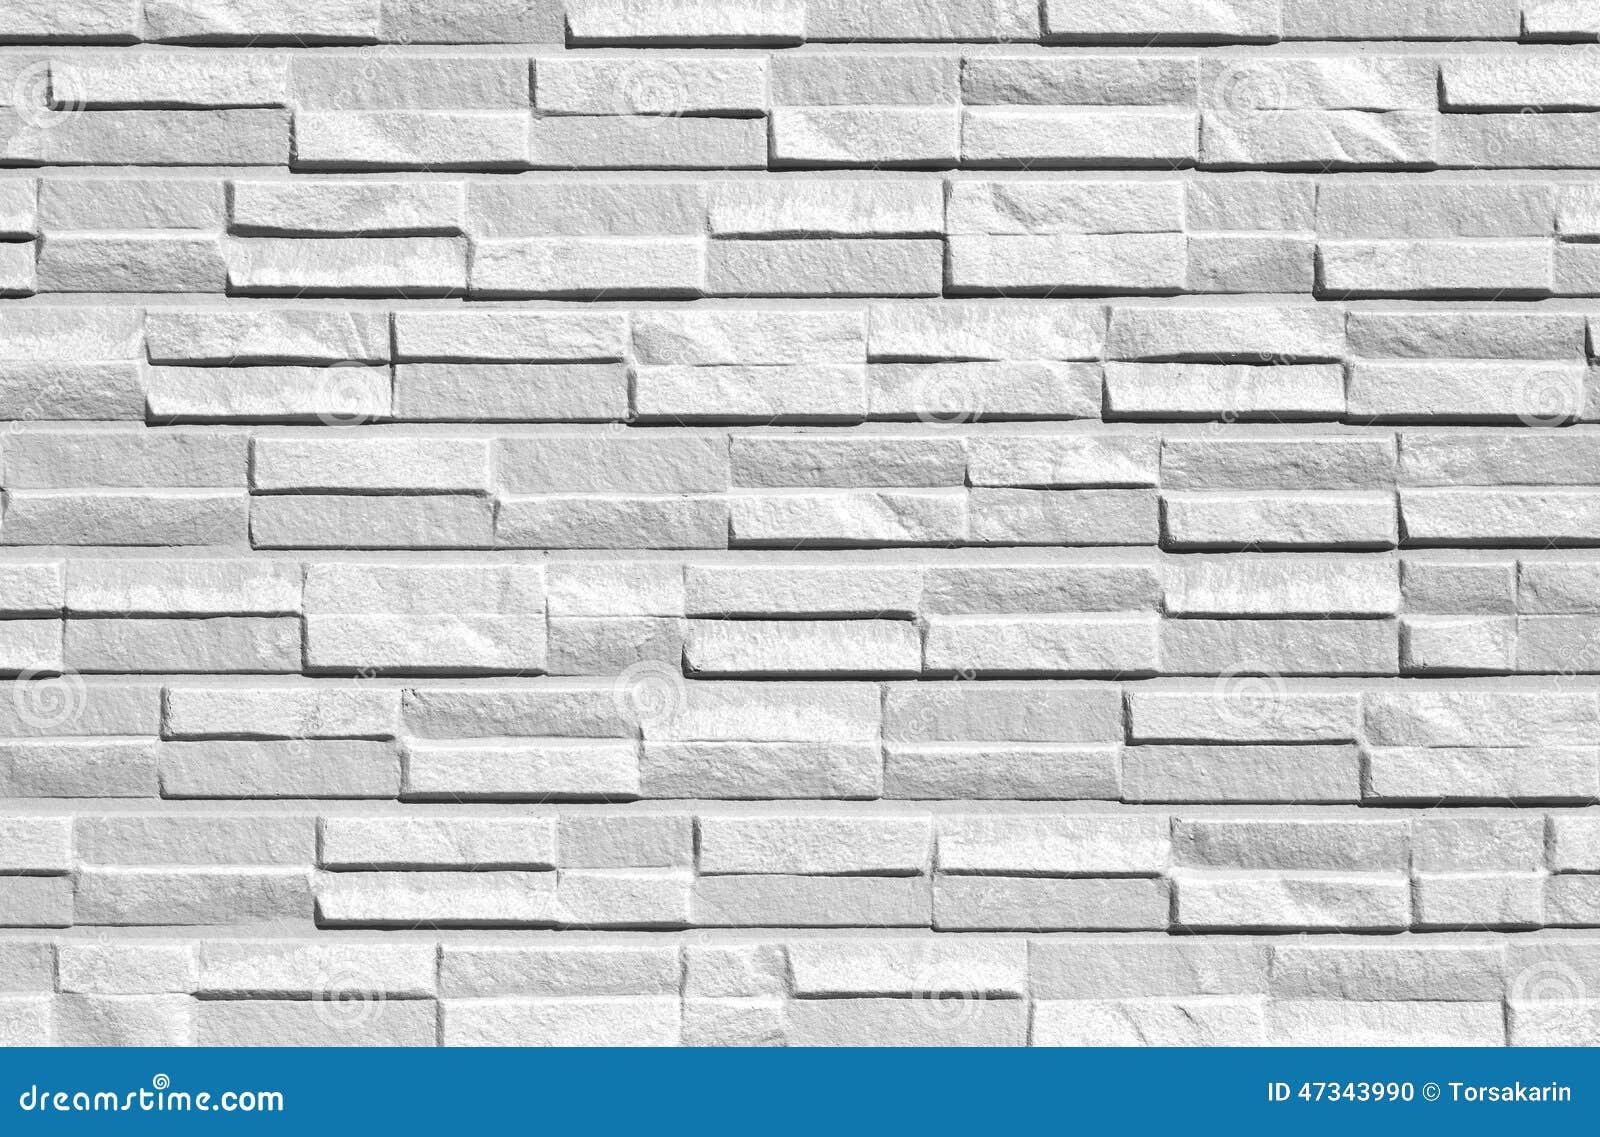 White concrete tile wall stock photo image 47343990 for White cement tiles